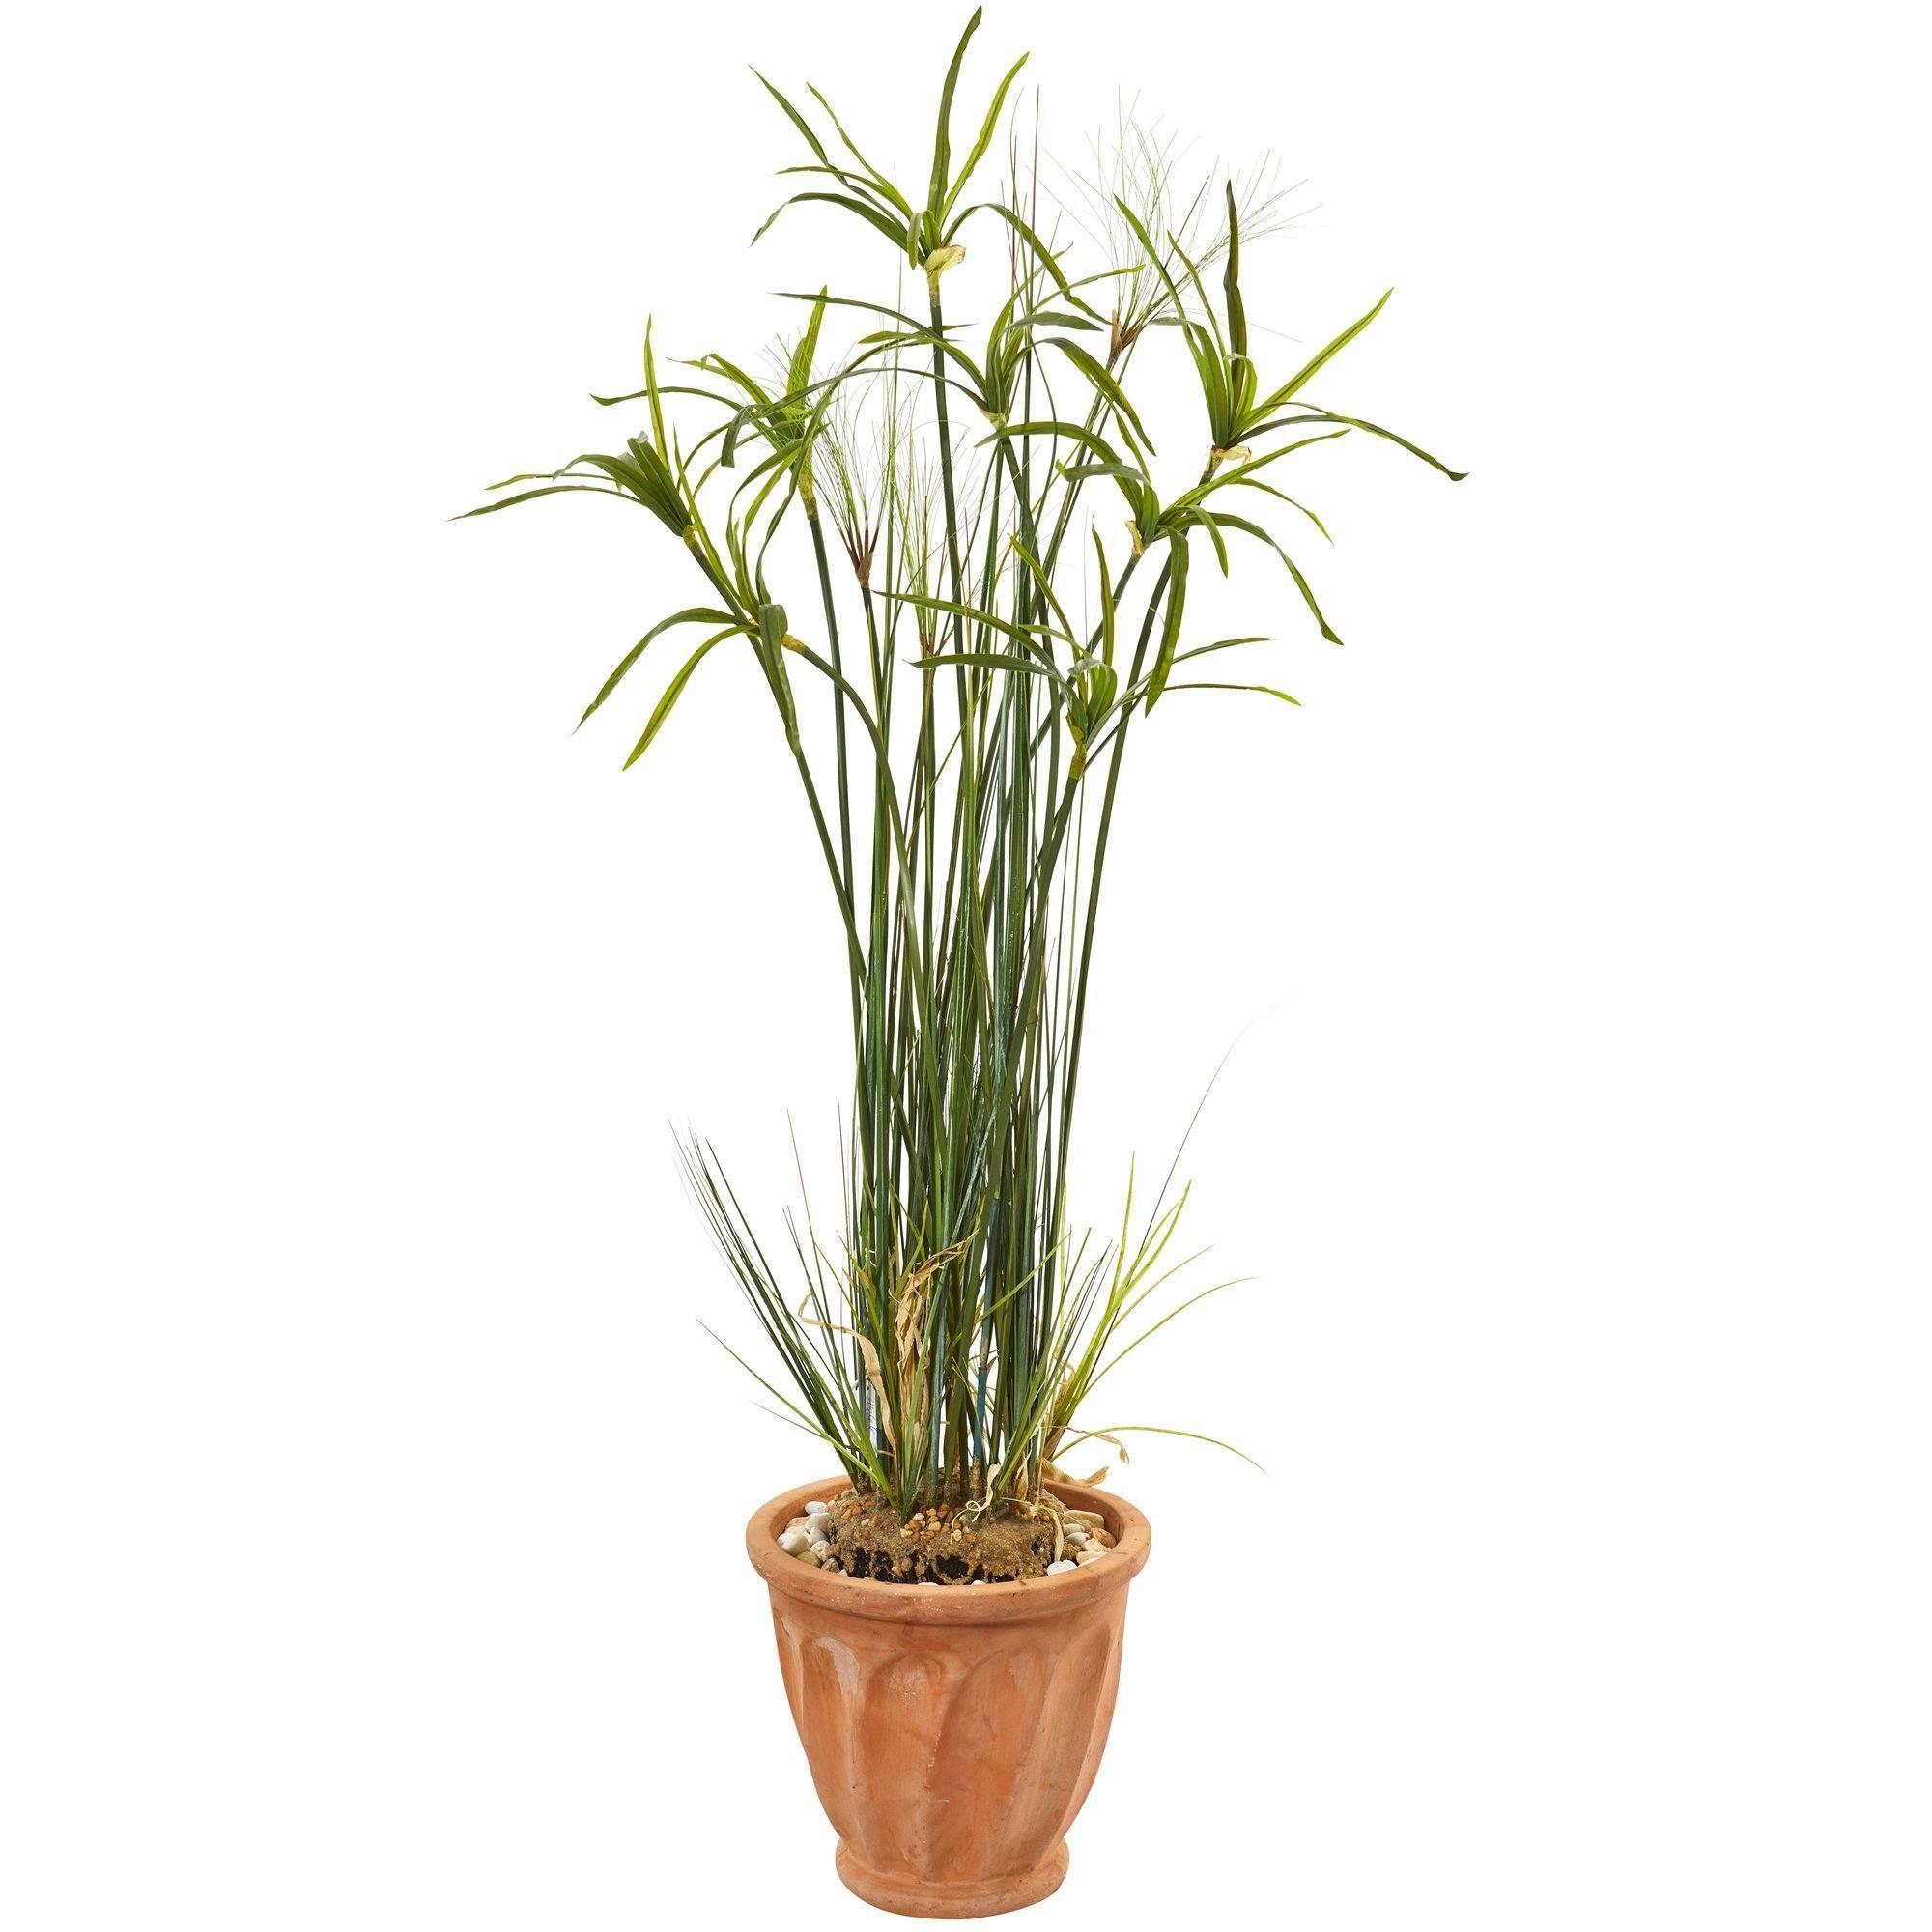 46 Papyrus Artificial Plant In Terracotta Planter Artificial Plants Artificial Foliage Terracotta Planter